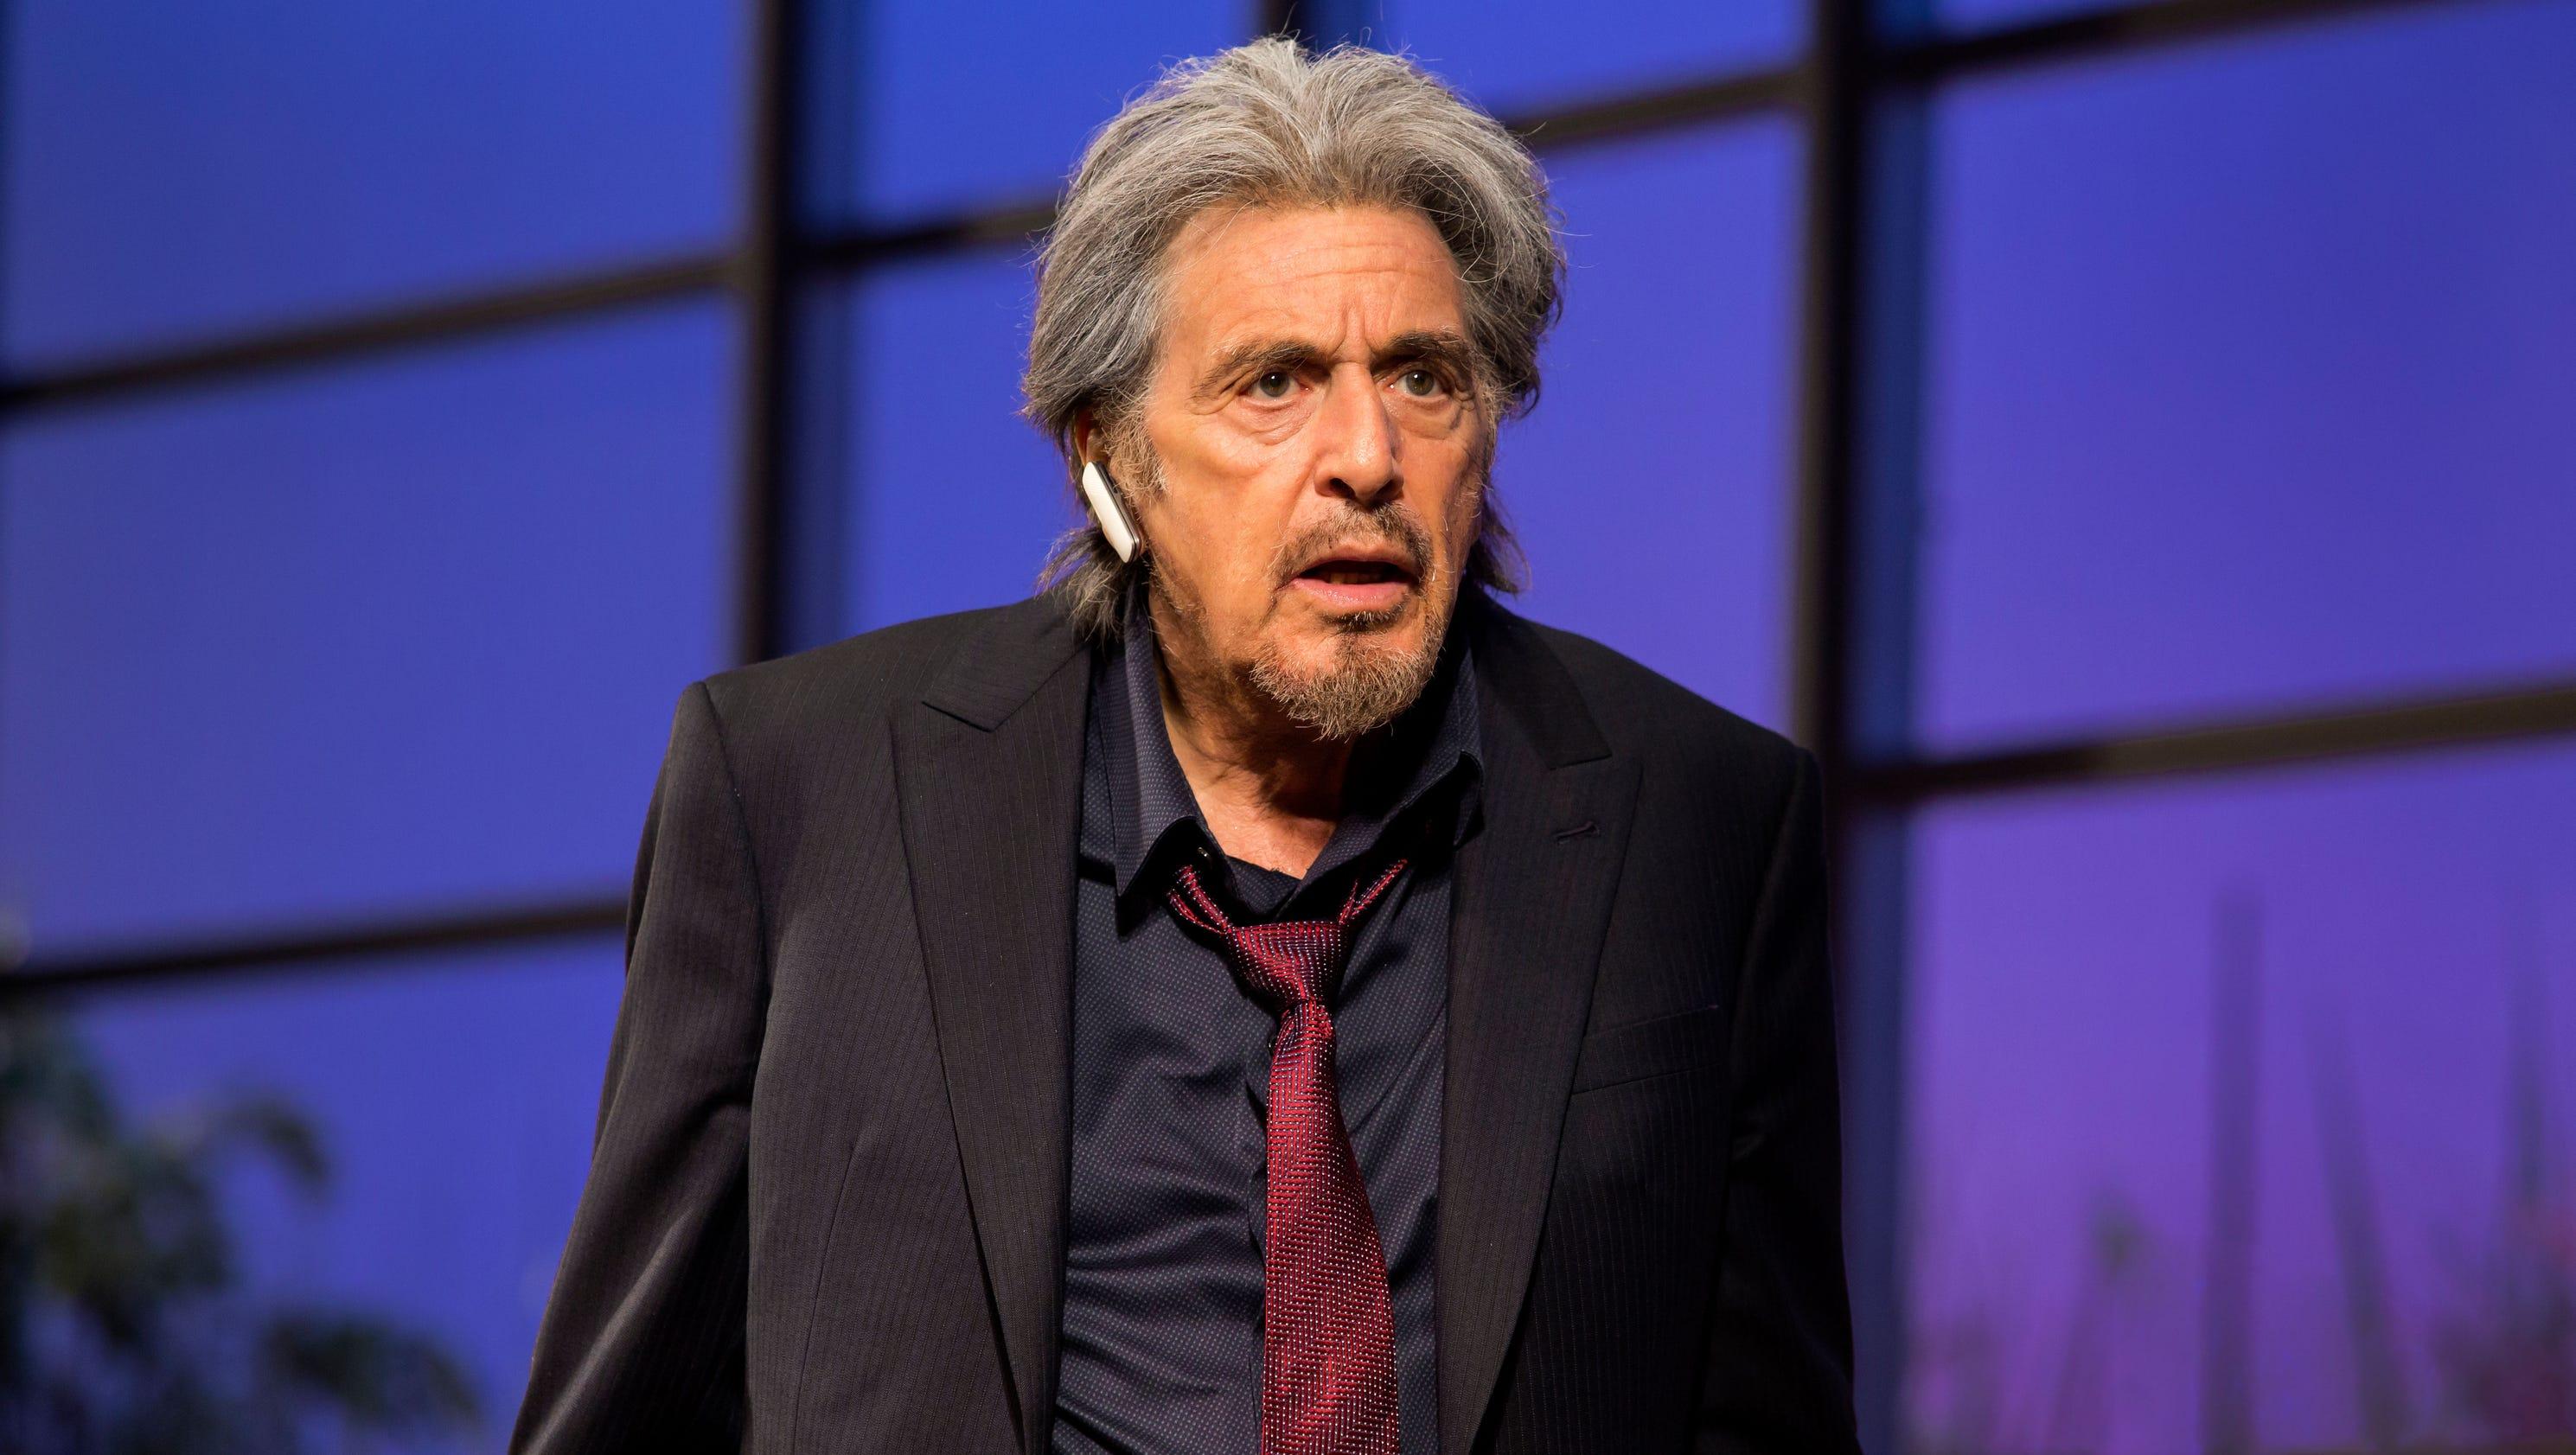 Al Pacino grabs attention in Mamet's 'China Doll' Al Pacino